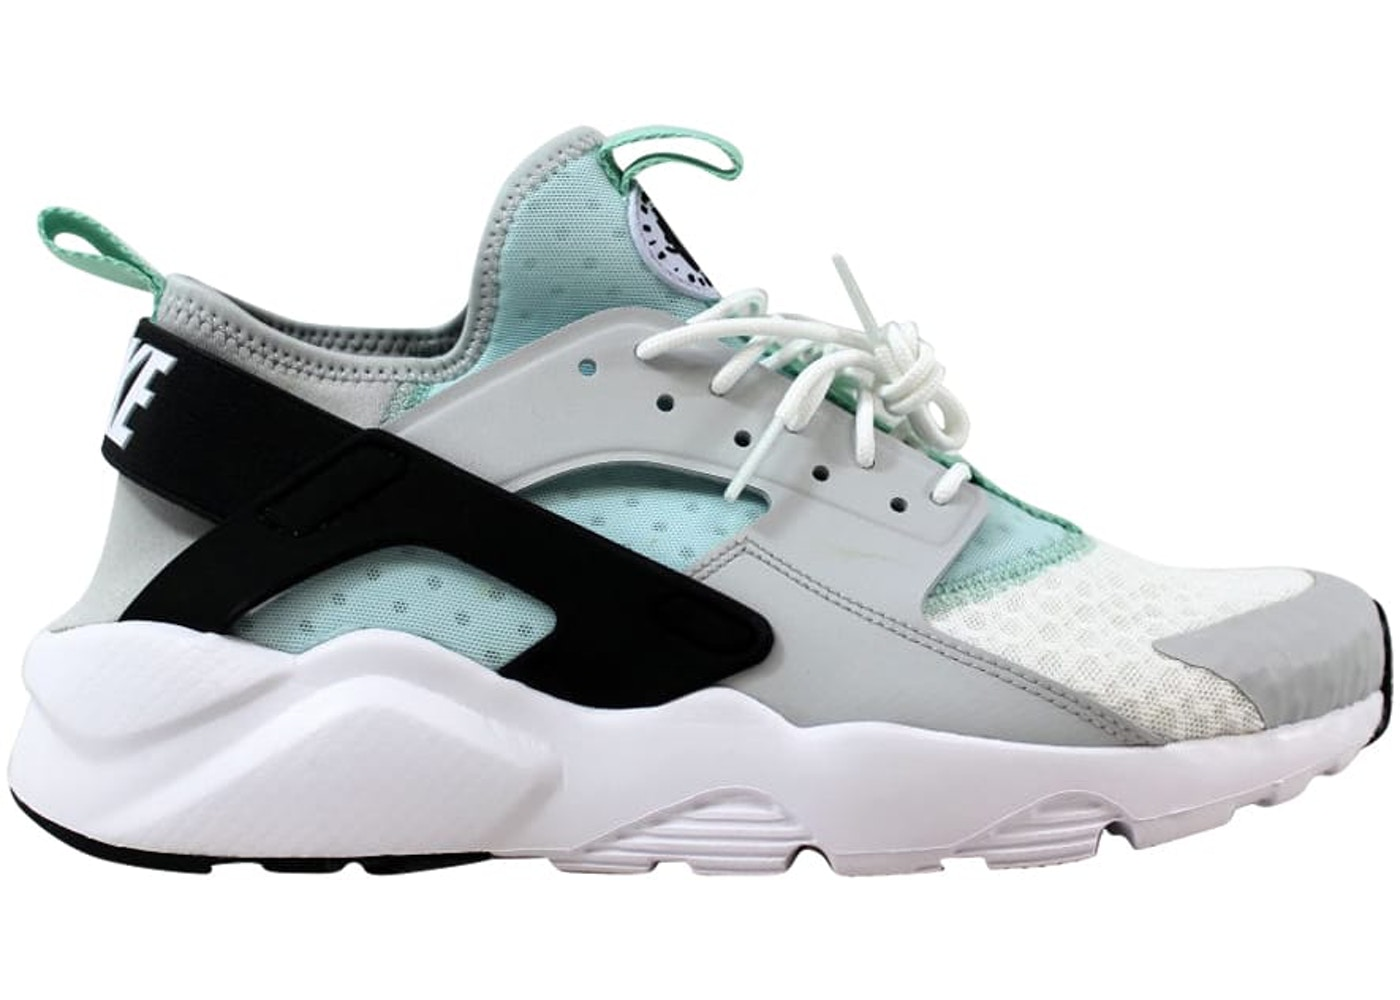 a58bcd75c41d Sell. or Ask. Size  10. View All Bids. Nike Air Huarache Run Ultra ...